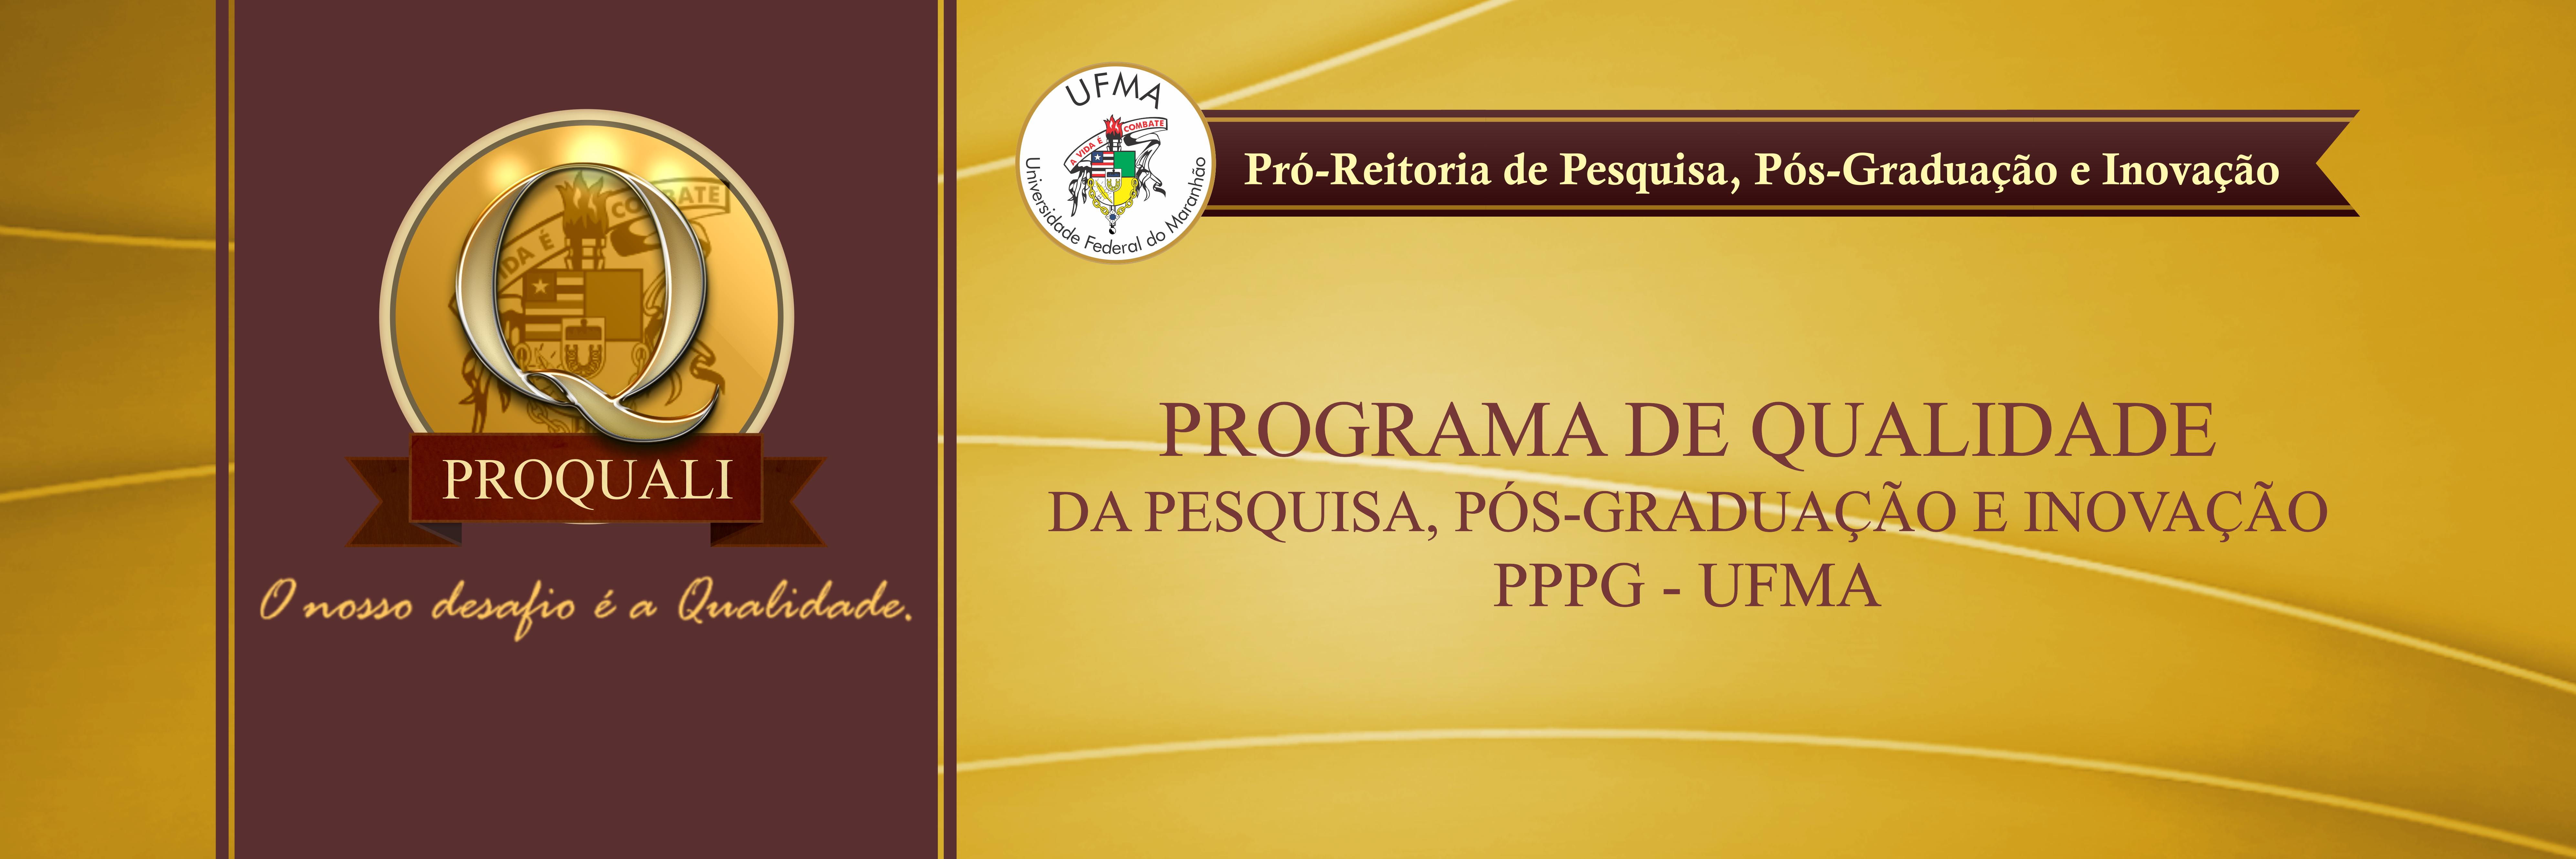 Banner Proquali